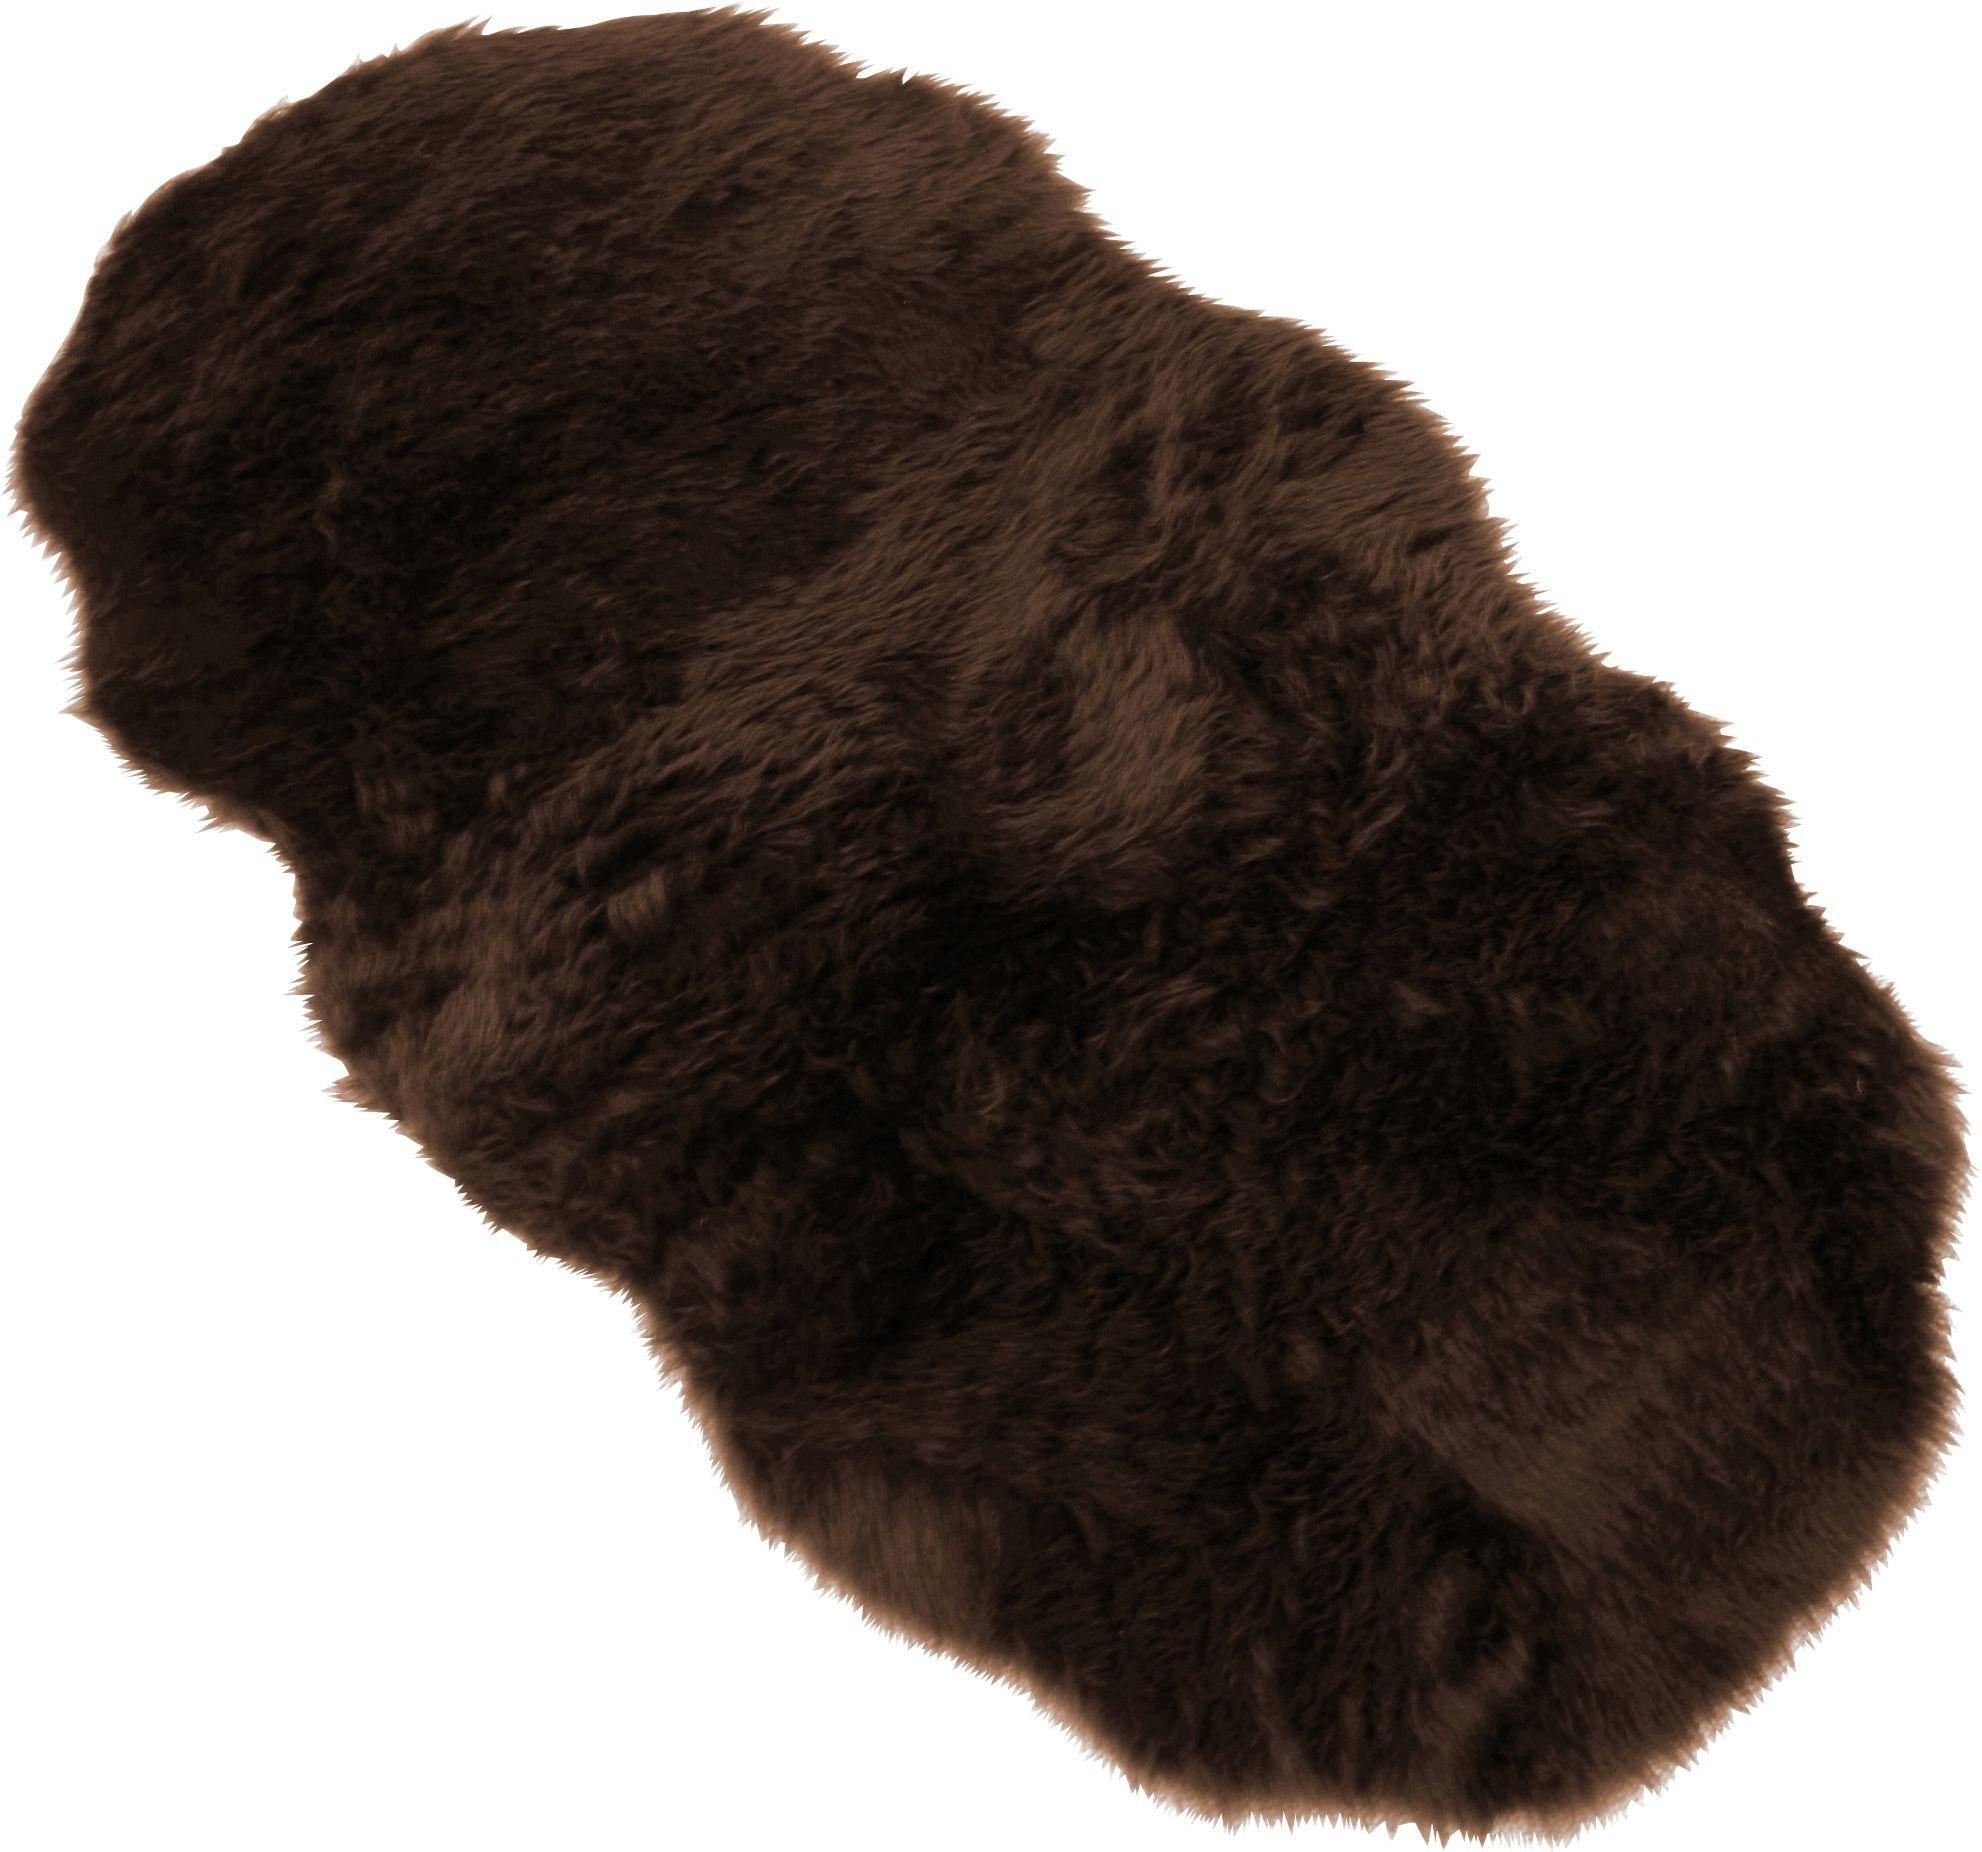 Homemaker Faux Fur Shagy Rug - 75x133cm - Brown